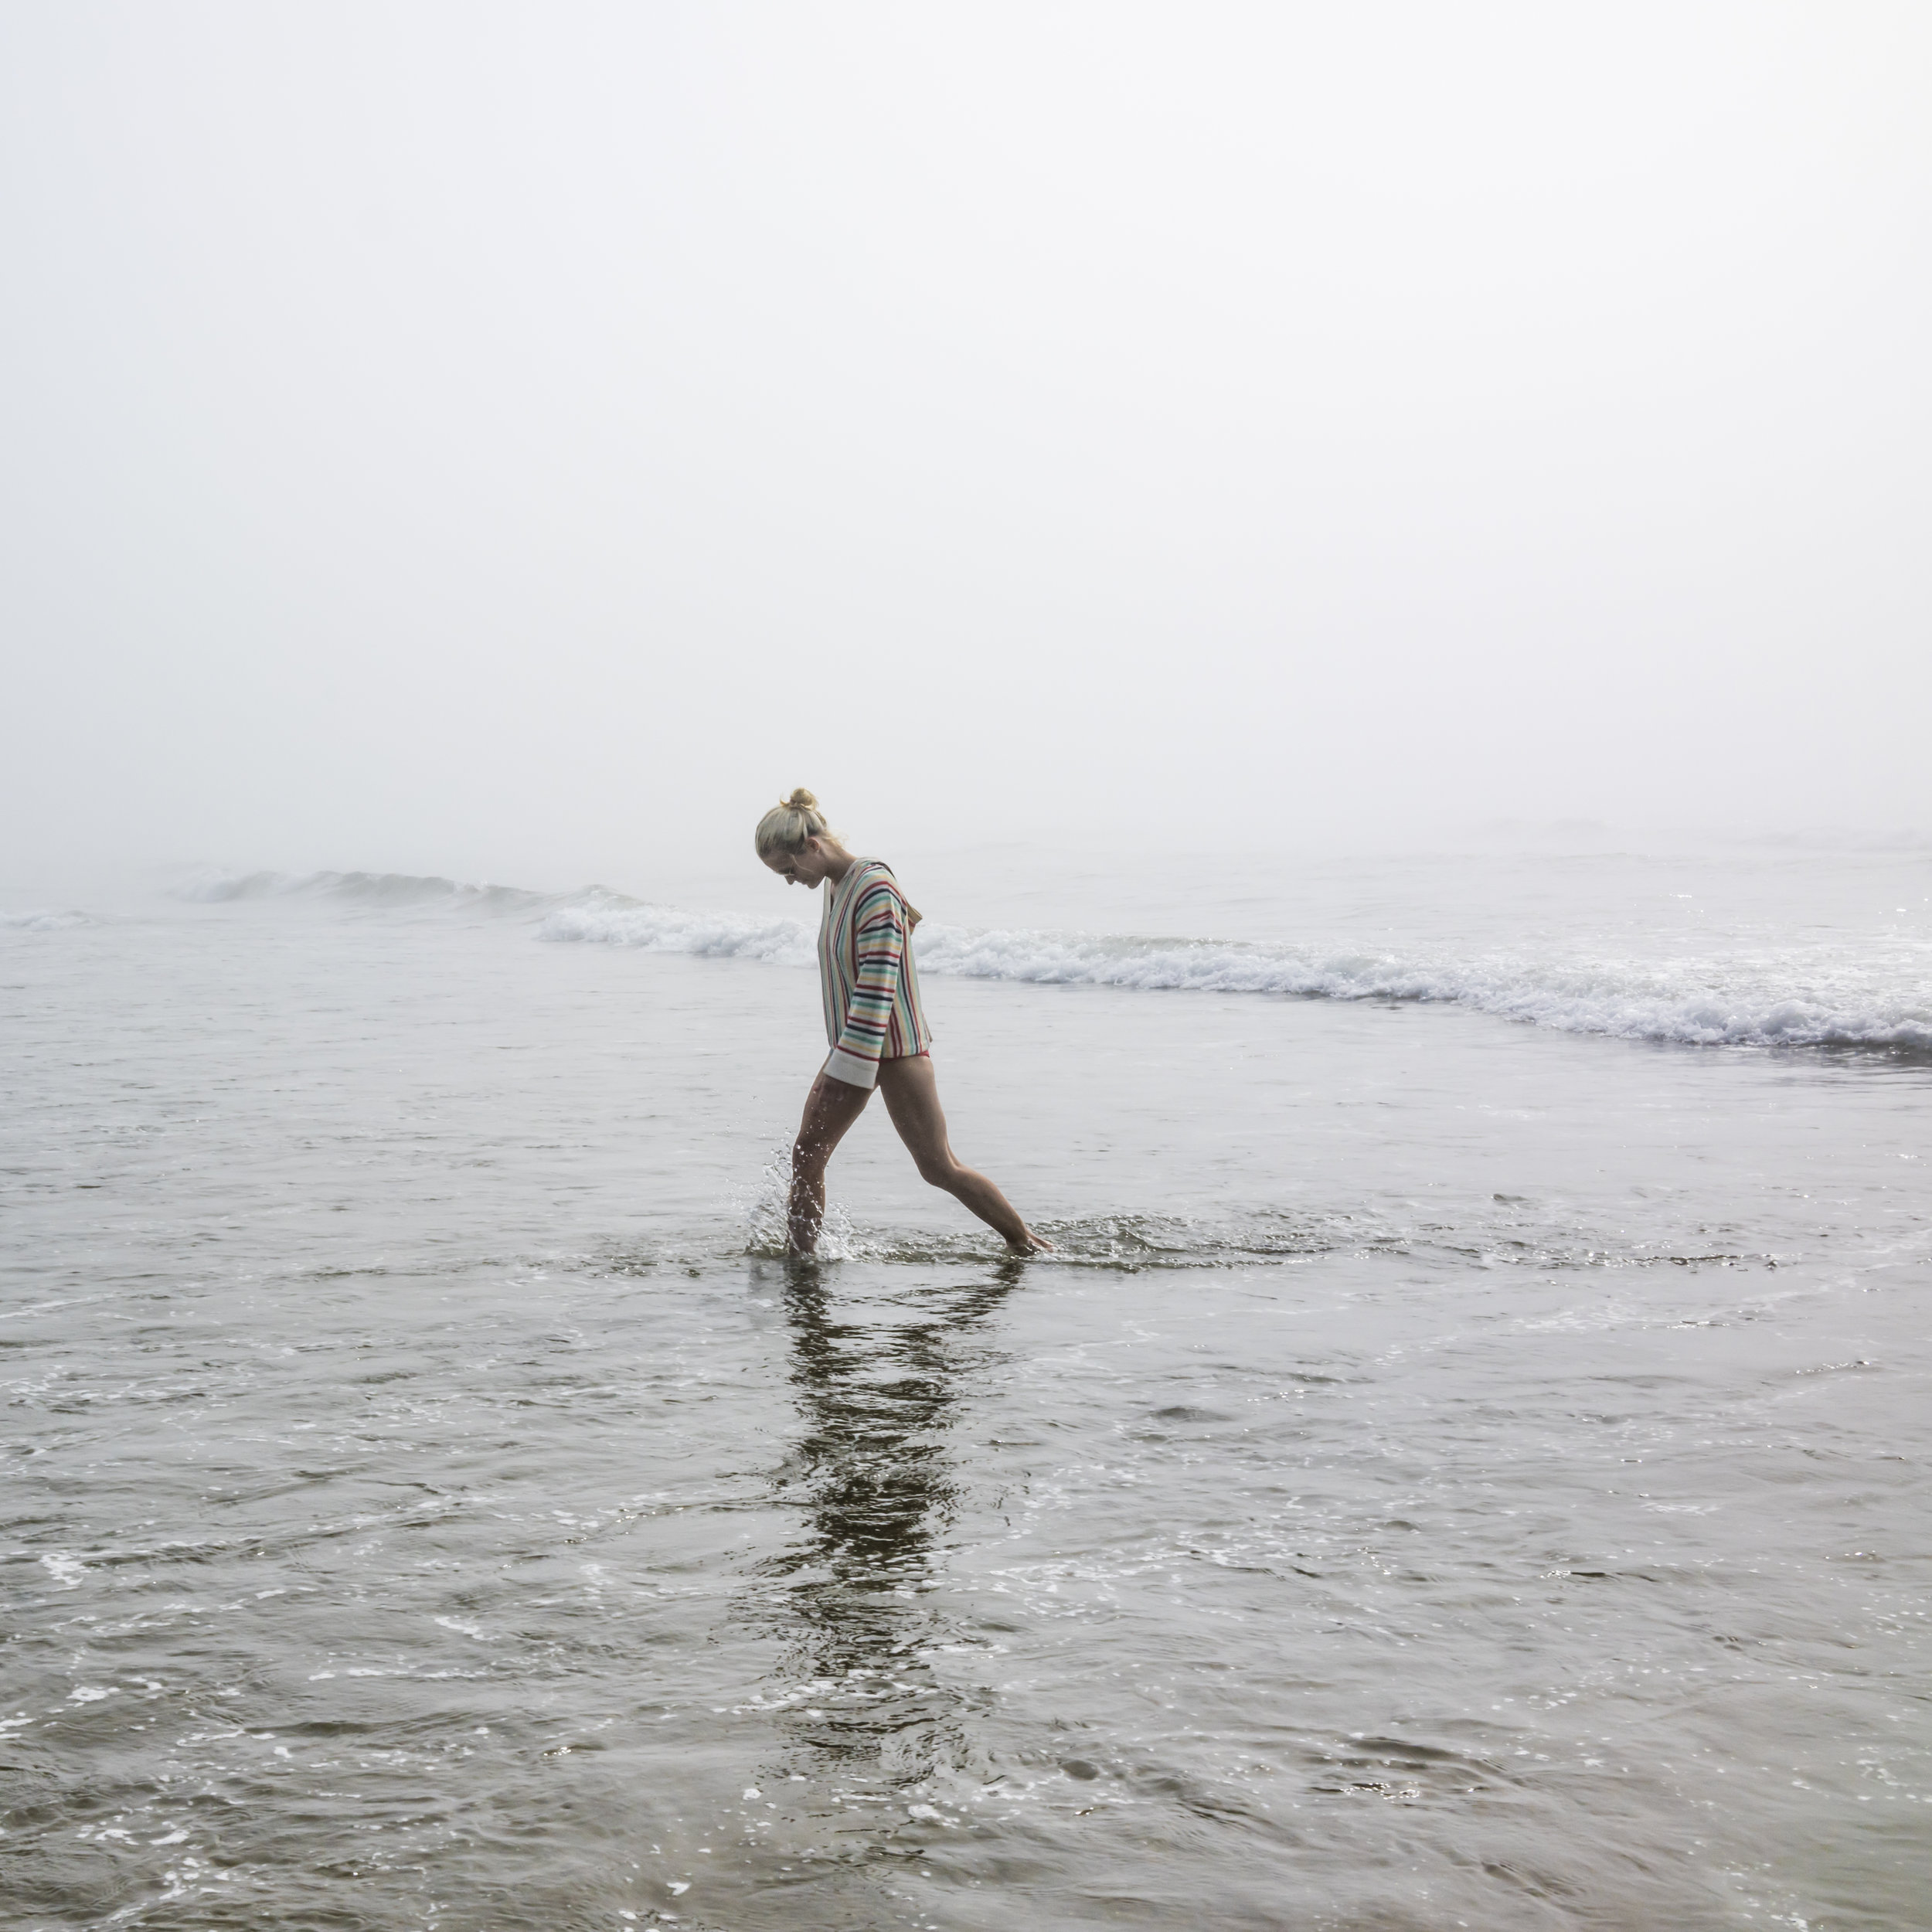 Mary in the Atlantic, 2017